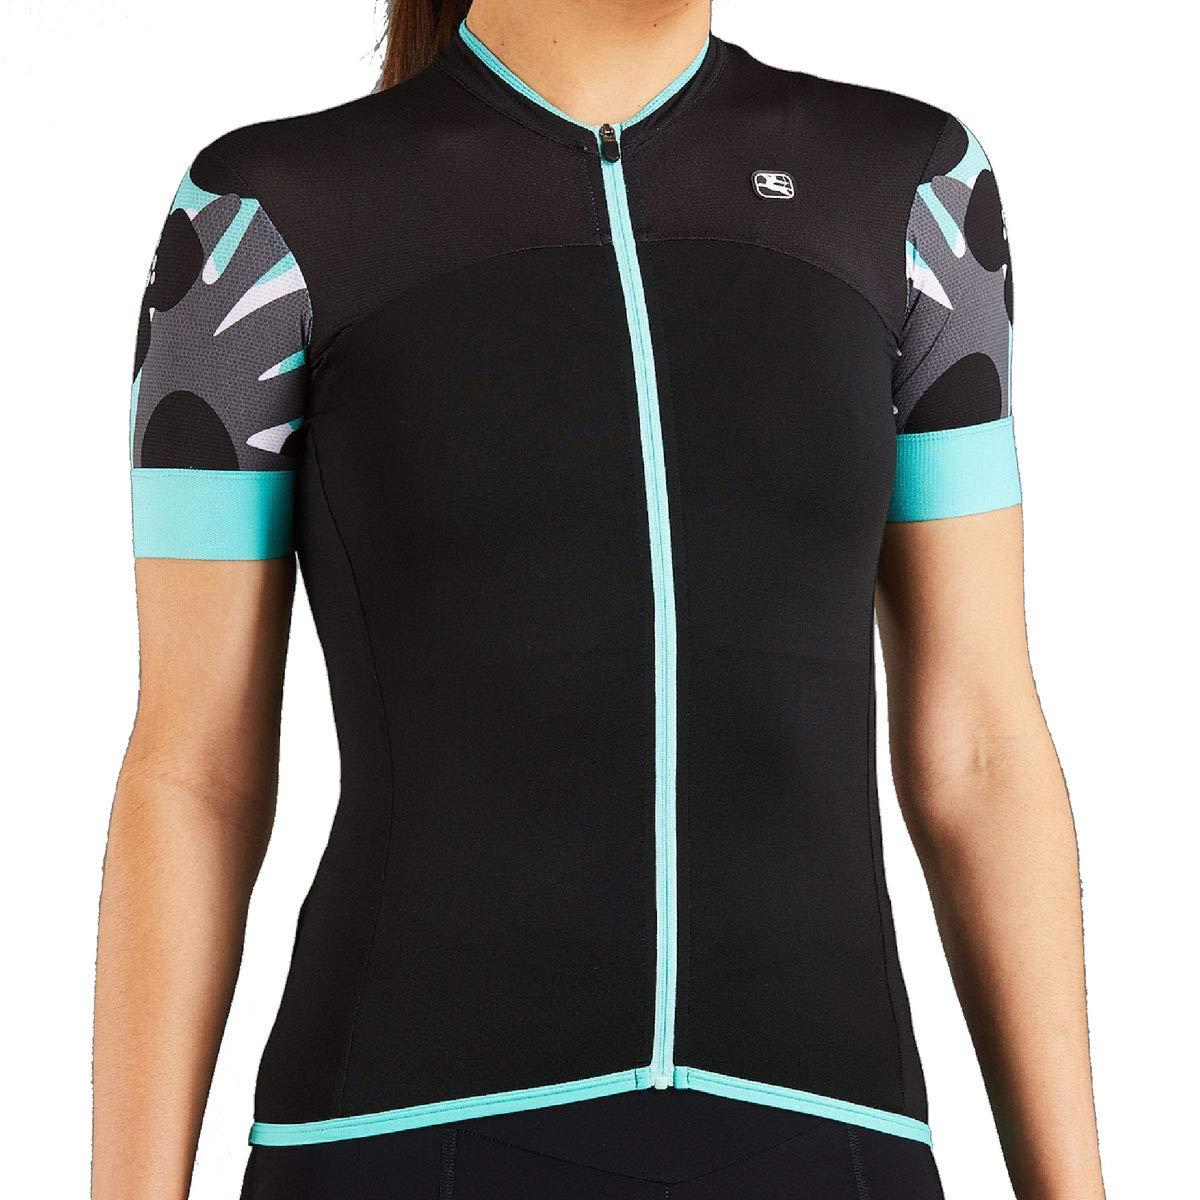 Giordana 2019 Women's Lungo Short Sleeve Cycling Jersey - GICS19-WSSJ-LUNG (Black/Mint/Grey - 2XL)